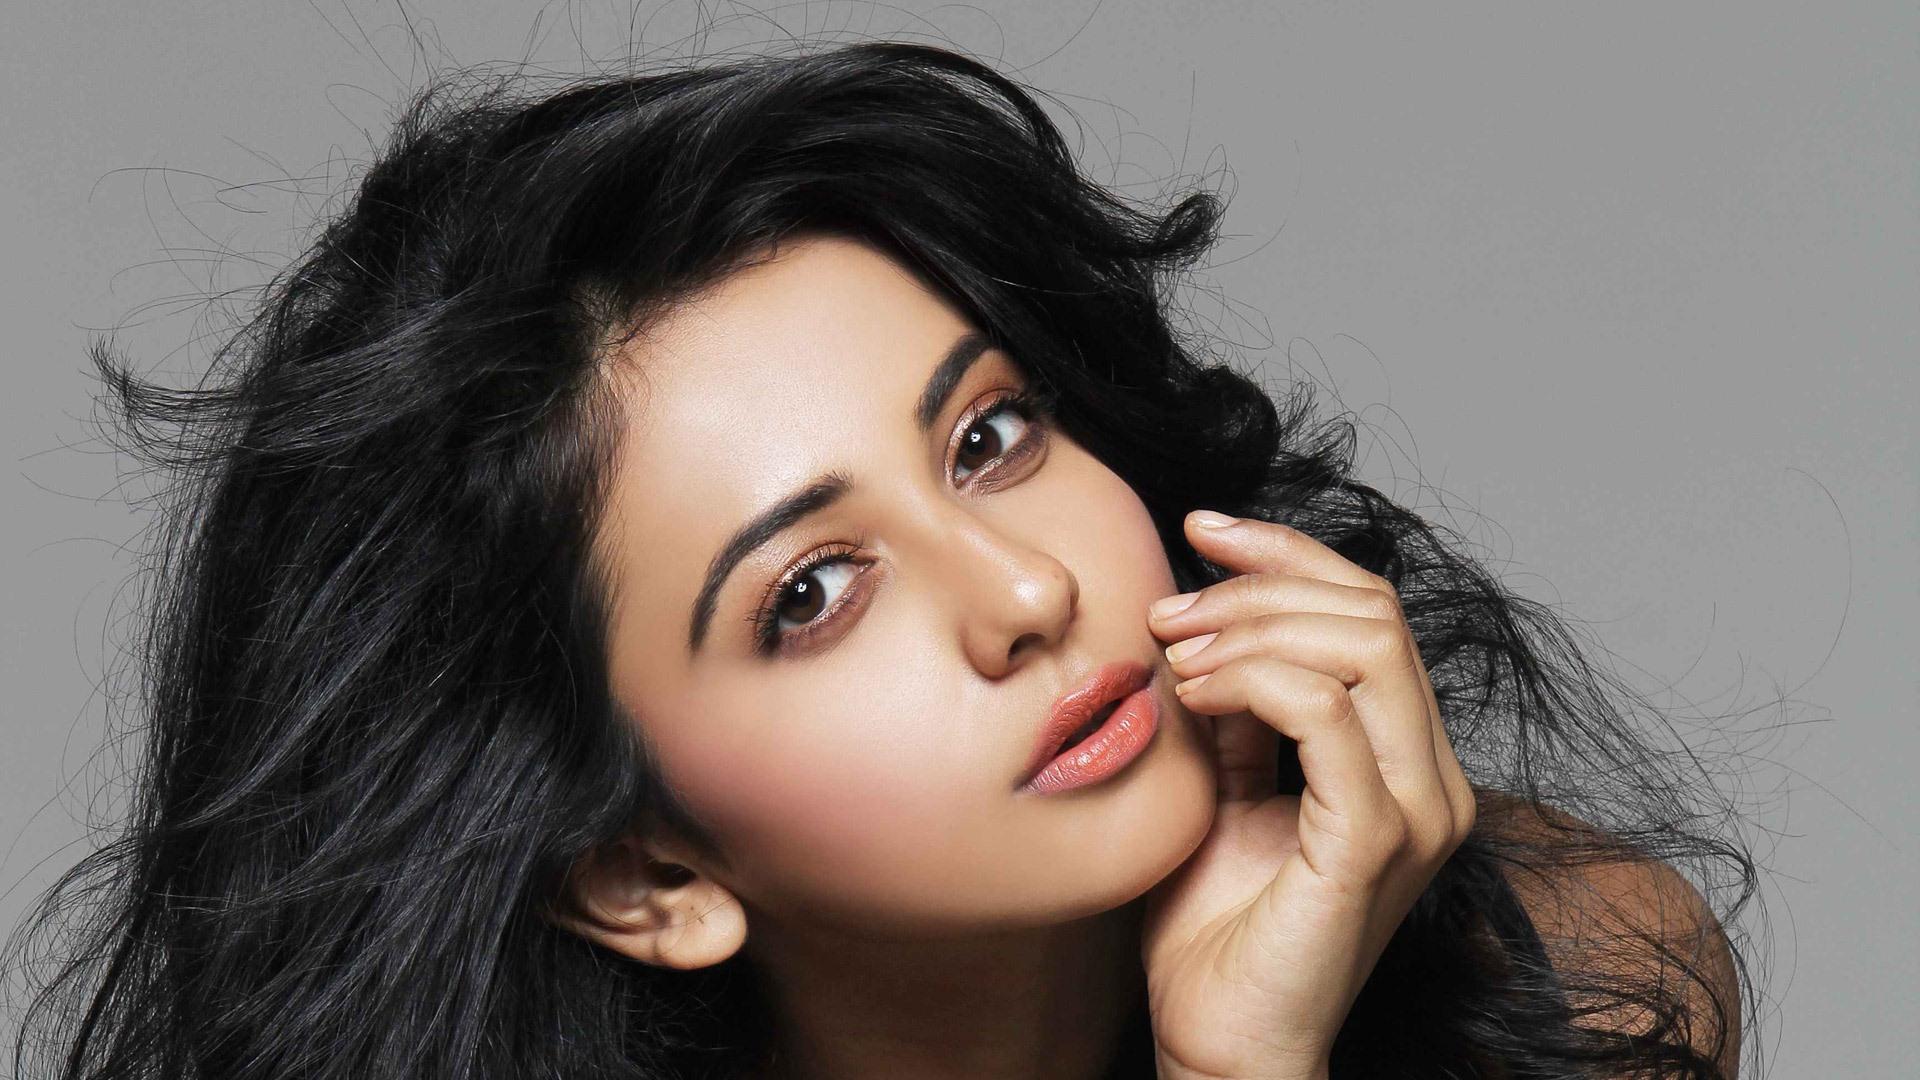 rakul preet singh beautiful actress hd wallpapers rocks 1920x1080